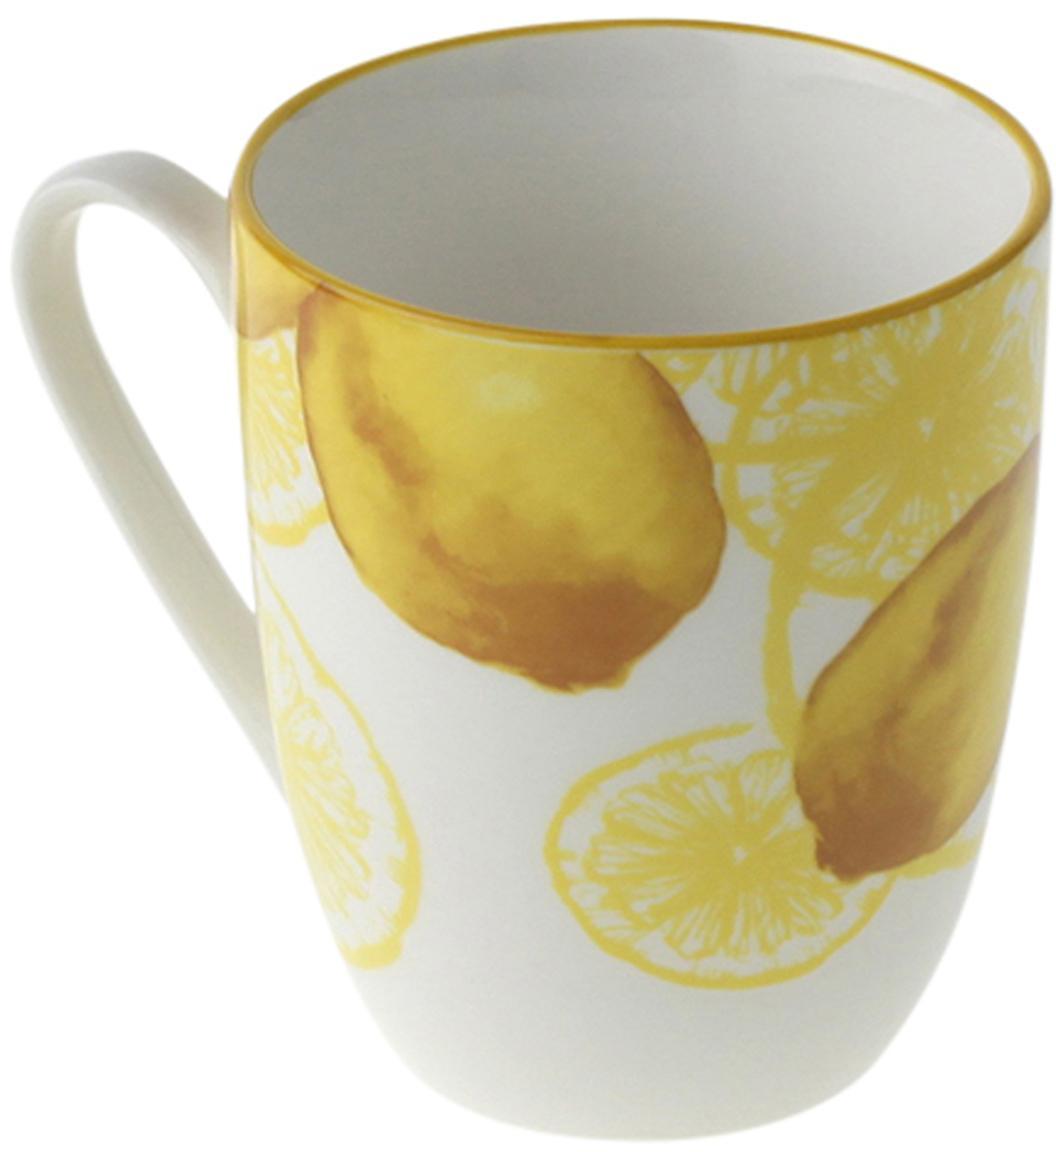 Tazas Lemon, 2uds., Porcelana, Blanco, amarillo, Ø 9 x Al 10 cm